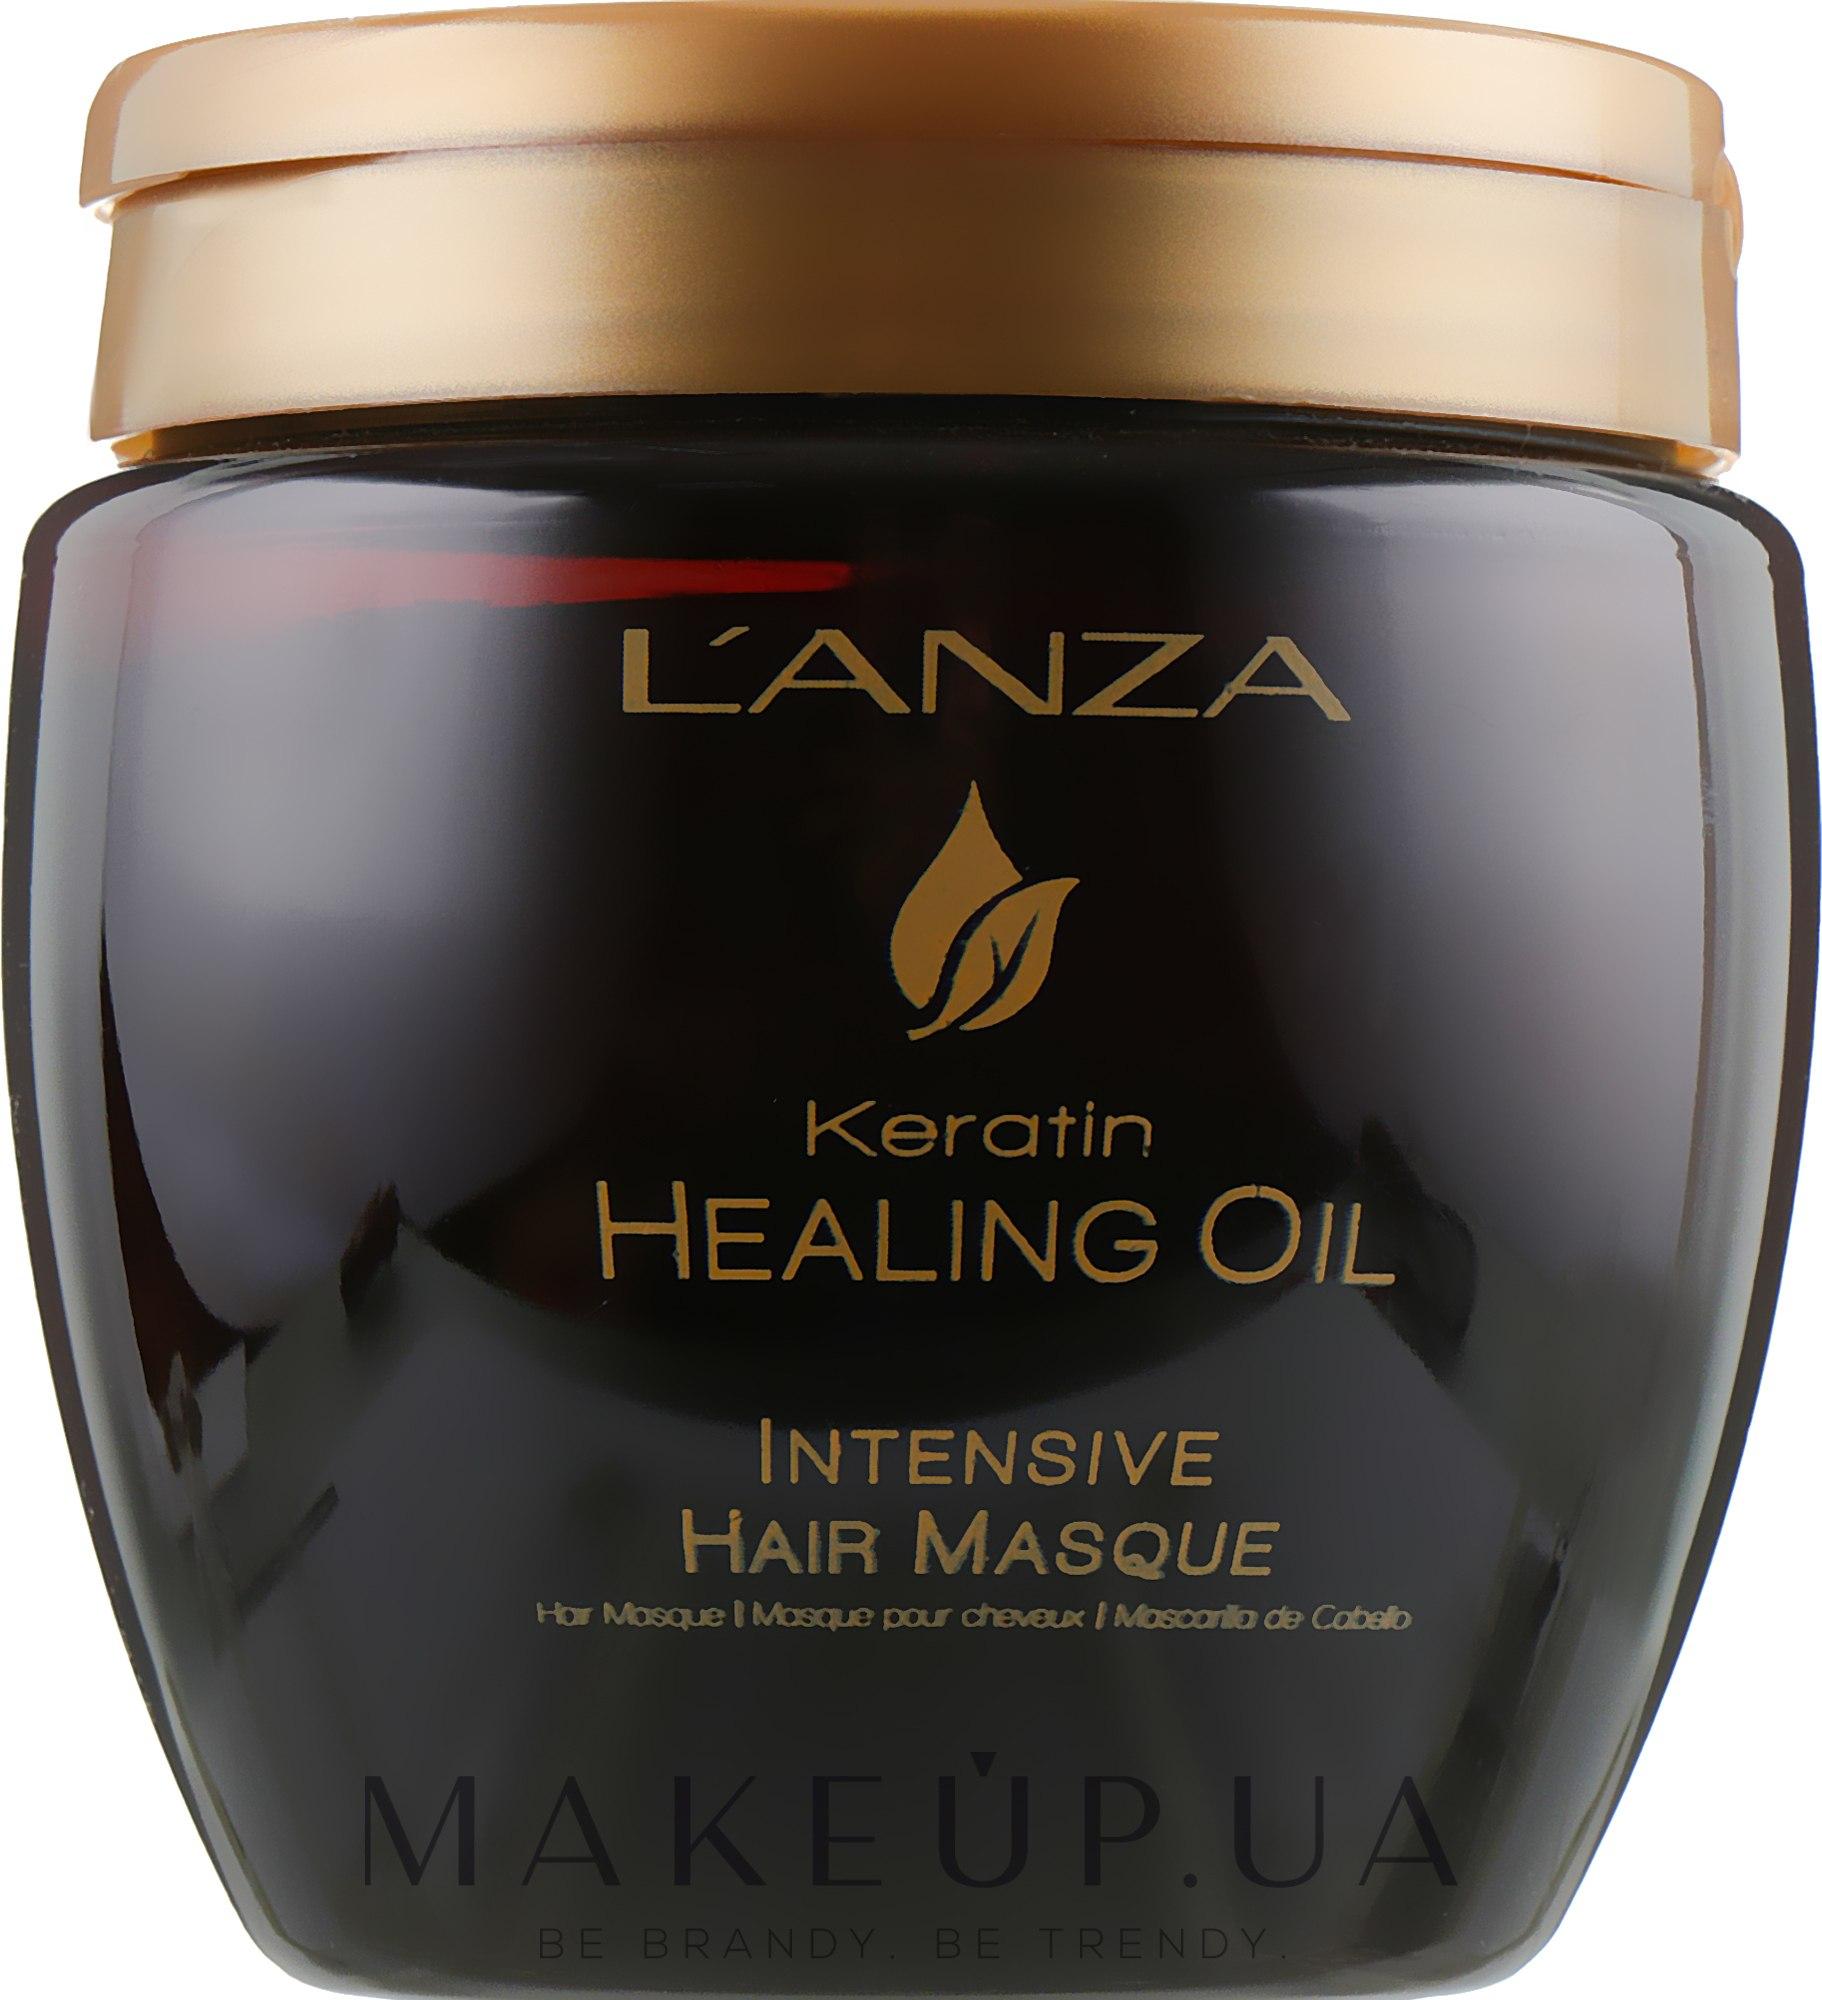 Интенсивная маска для волос - L'anza Keratin Healing Oil Intesive Hair Masque — фото 210ml